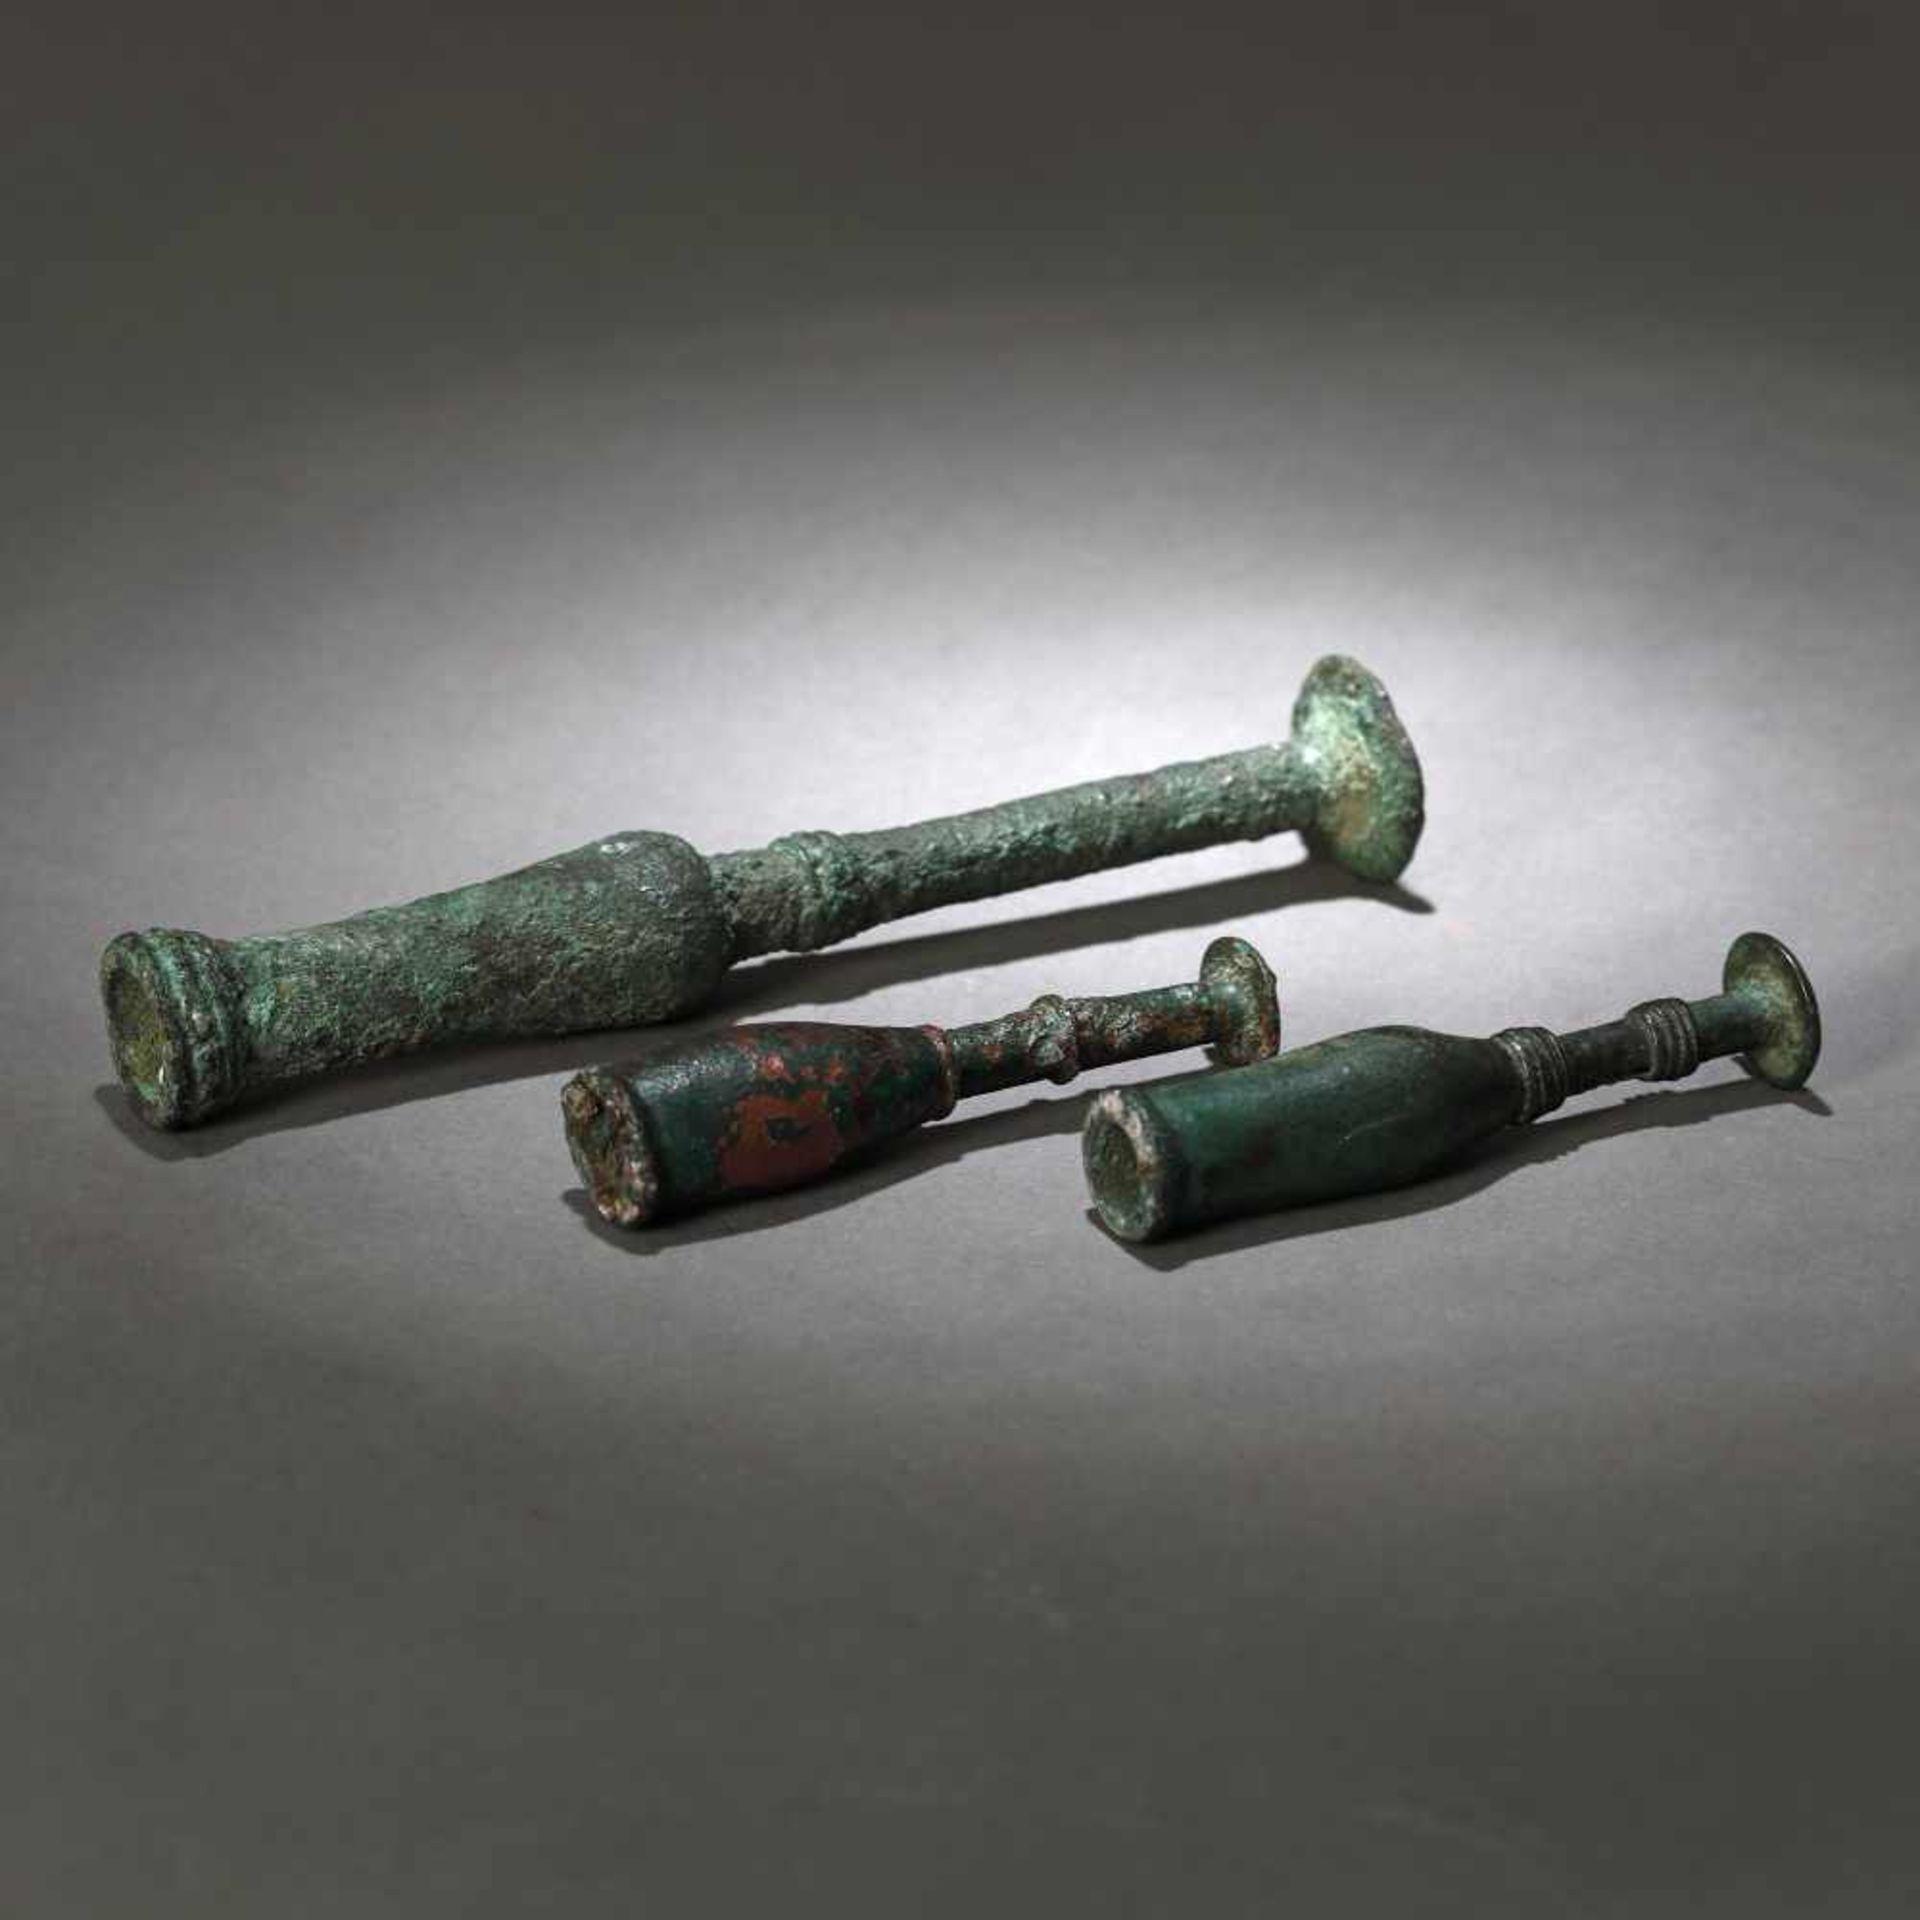 Three bronze candlesticks, possibly Luristan, Persia, the first part of the first millennium B.C. - Bild 2 aus 2